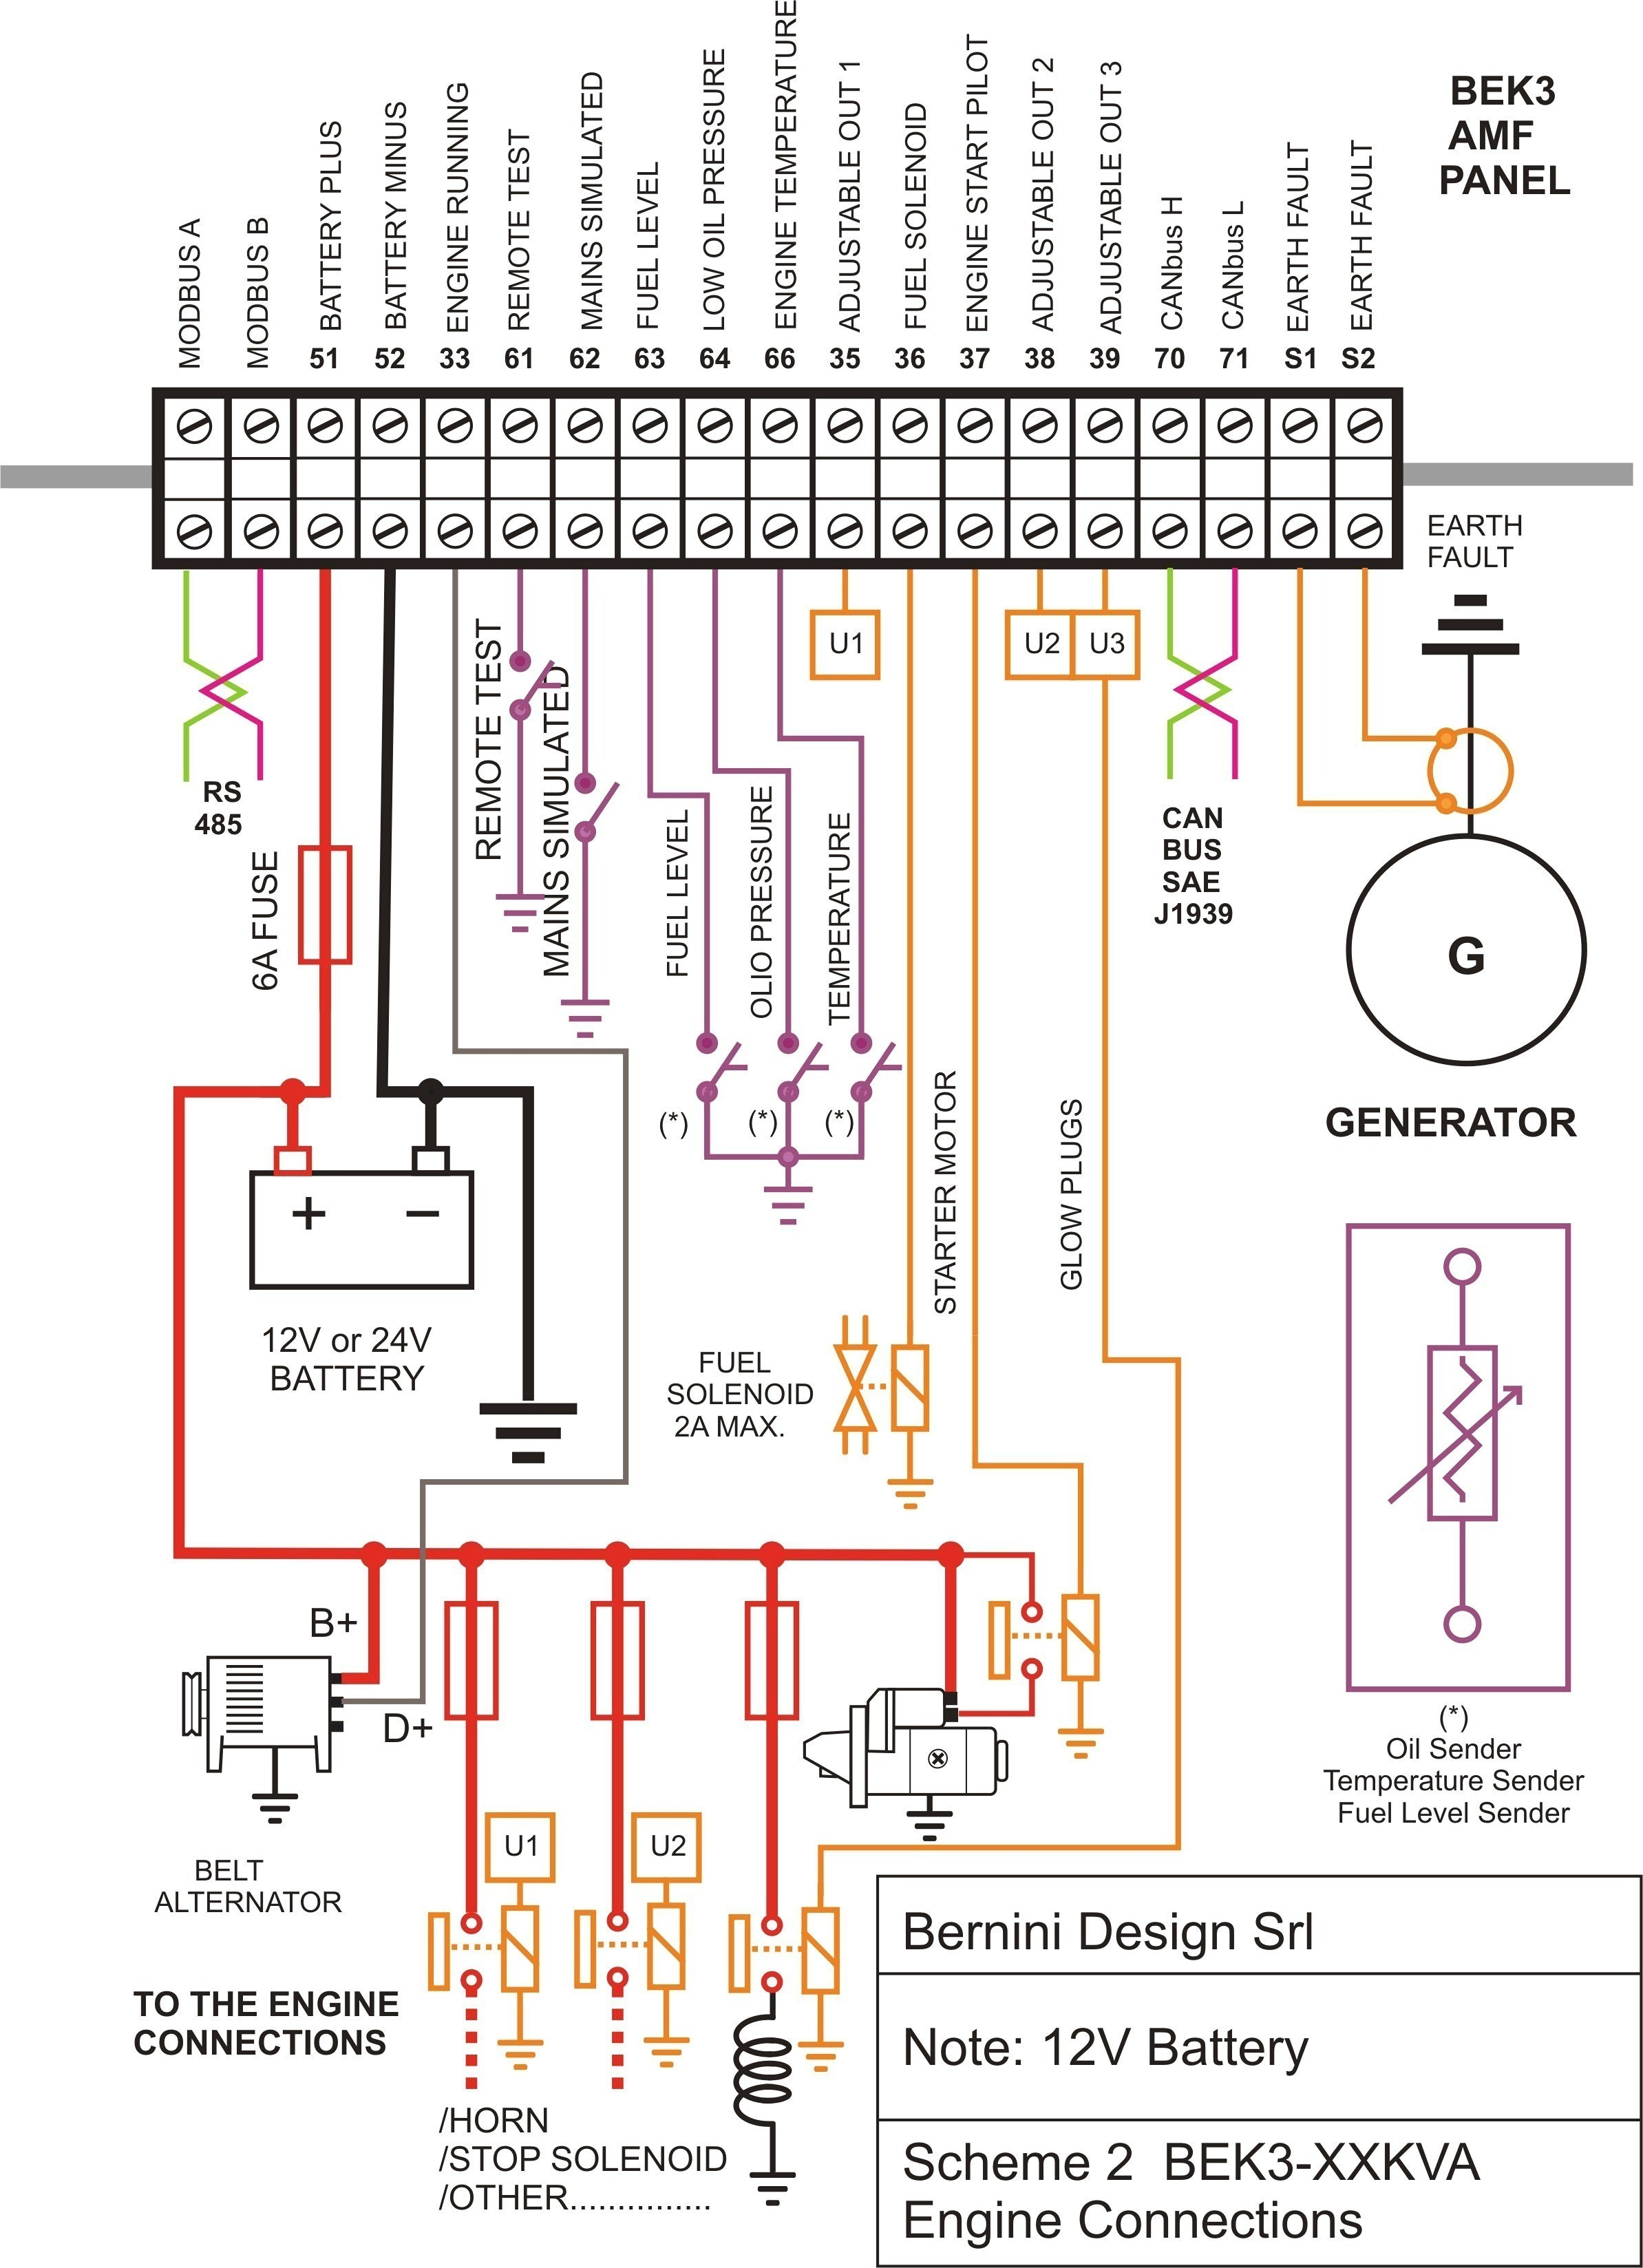 Tokheim Premier B Wiring Diagram Modern Design Of Ethernet Cable Guide Data Today Rh 41 Unimath De Cat5